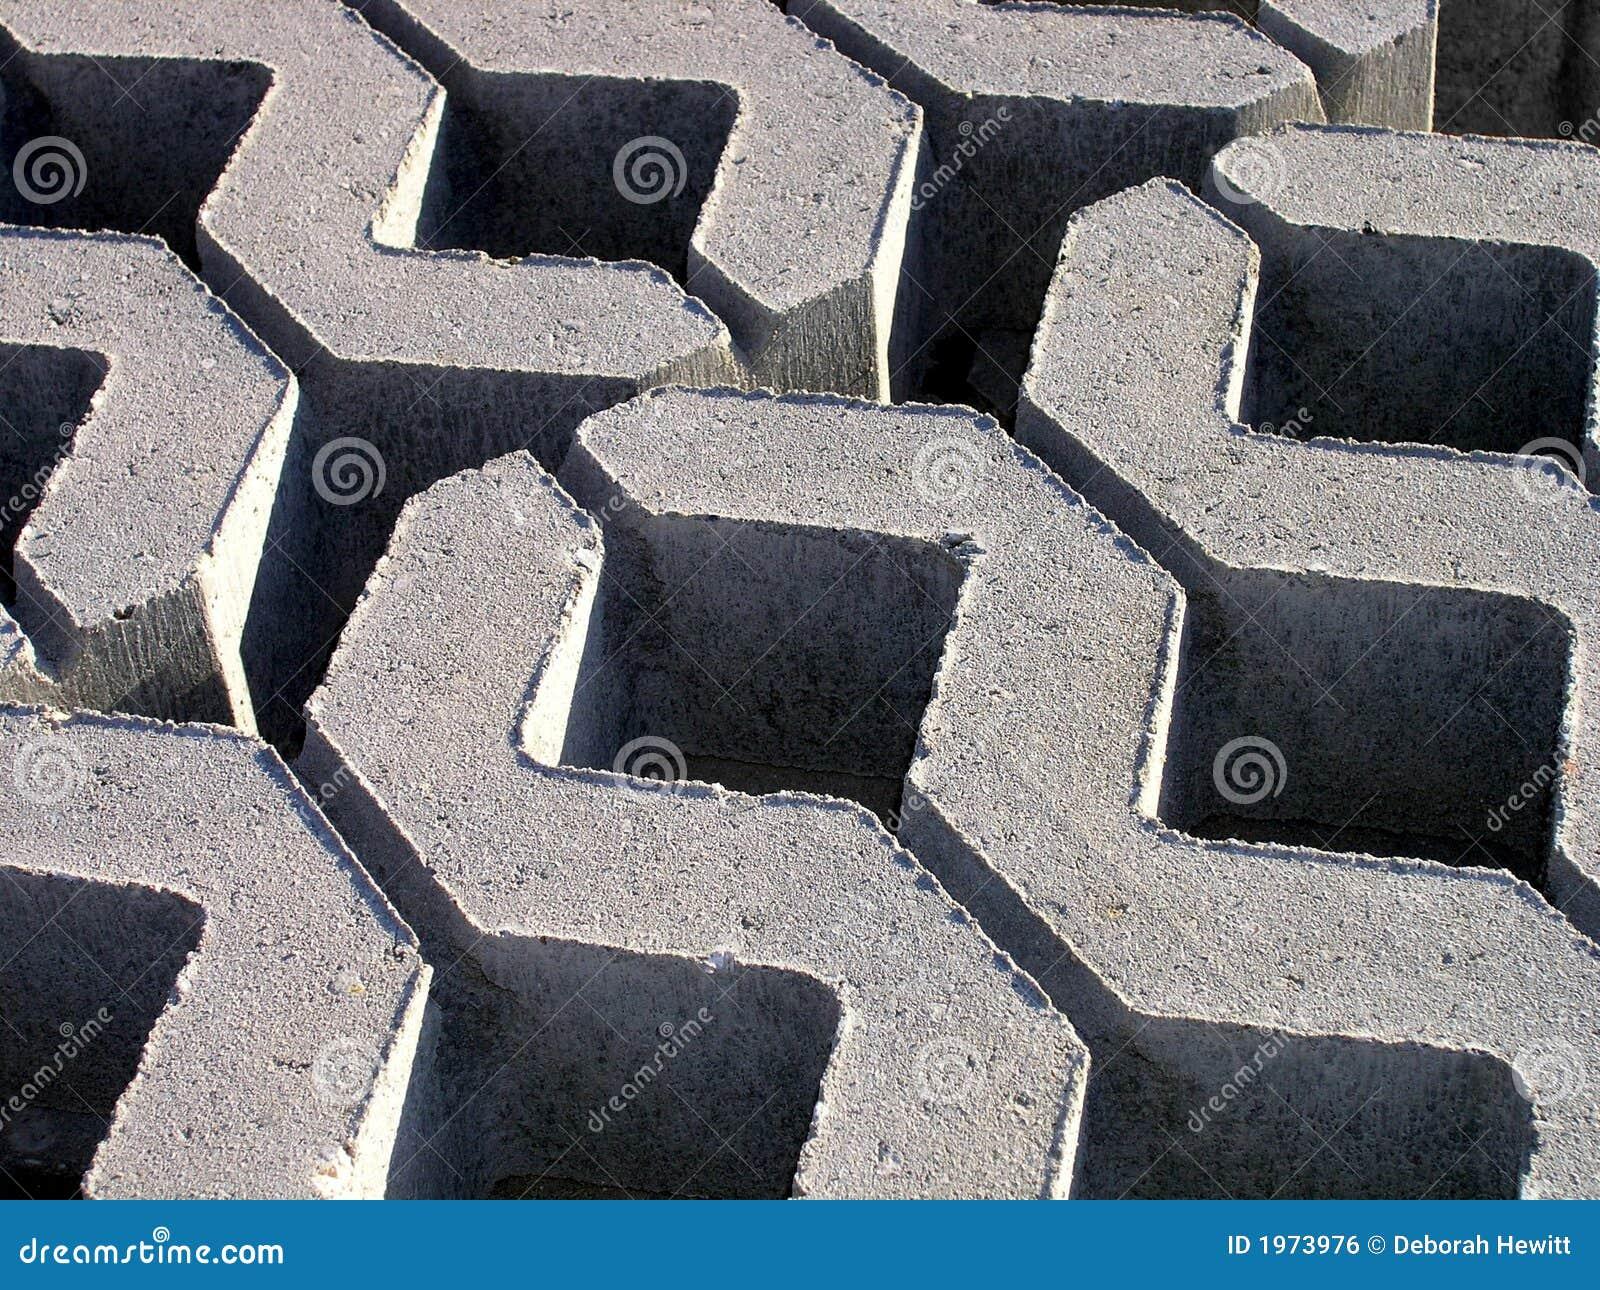 Concrete Building Blocks : Zig zag concrete building blocks royalty free stock image